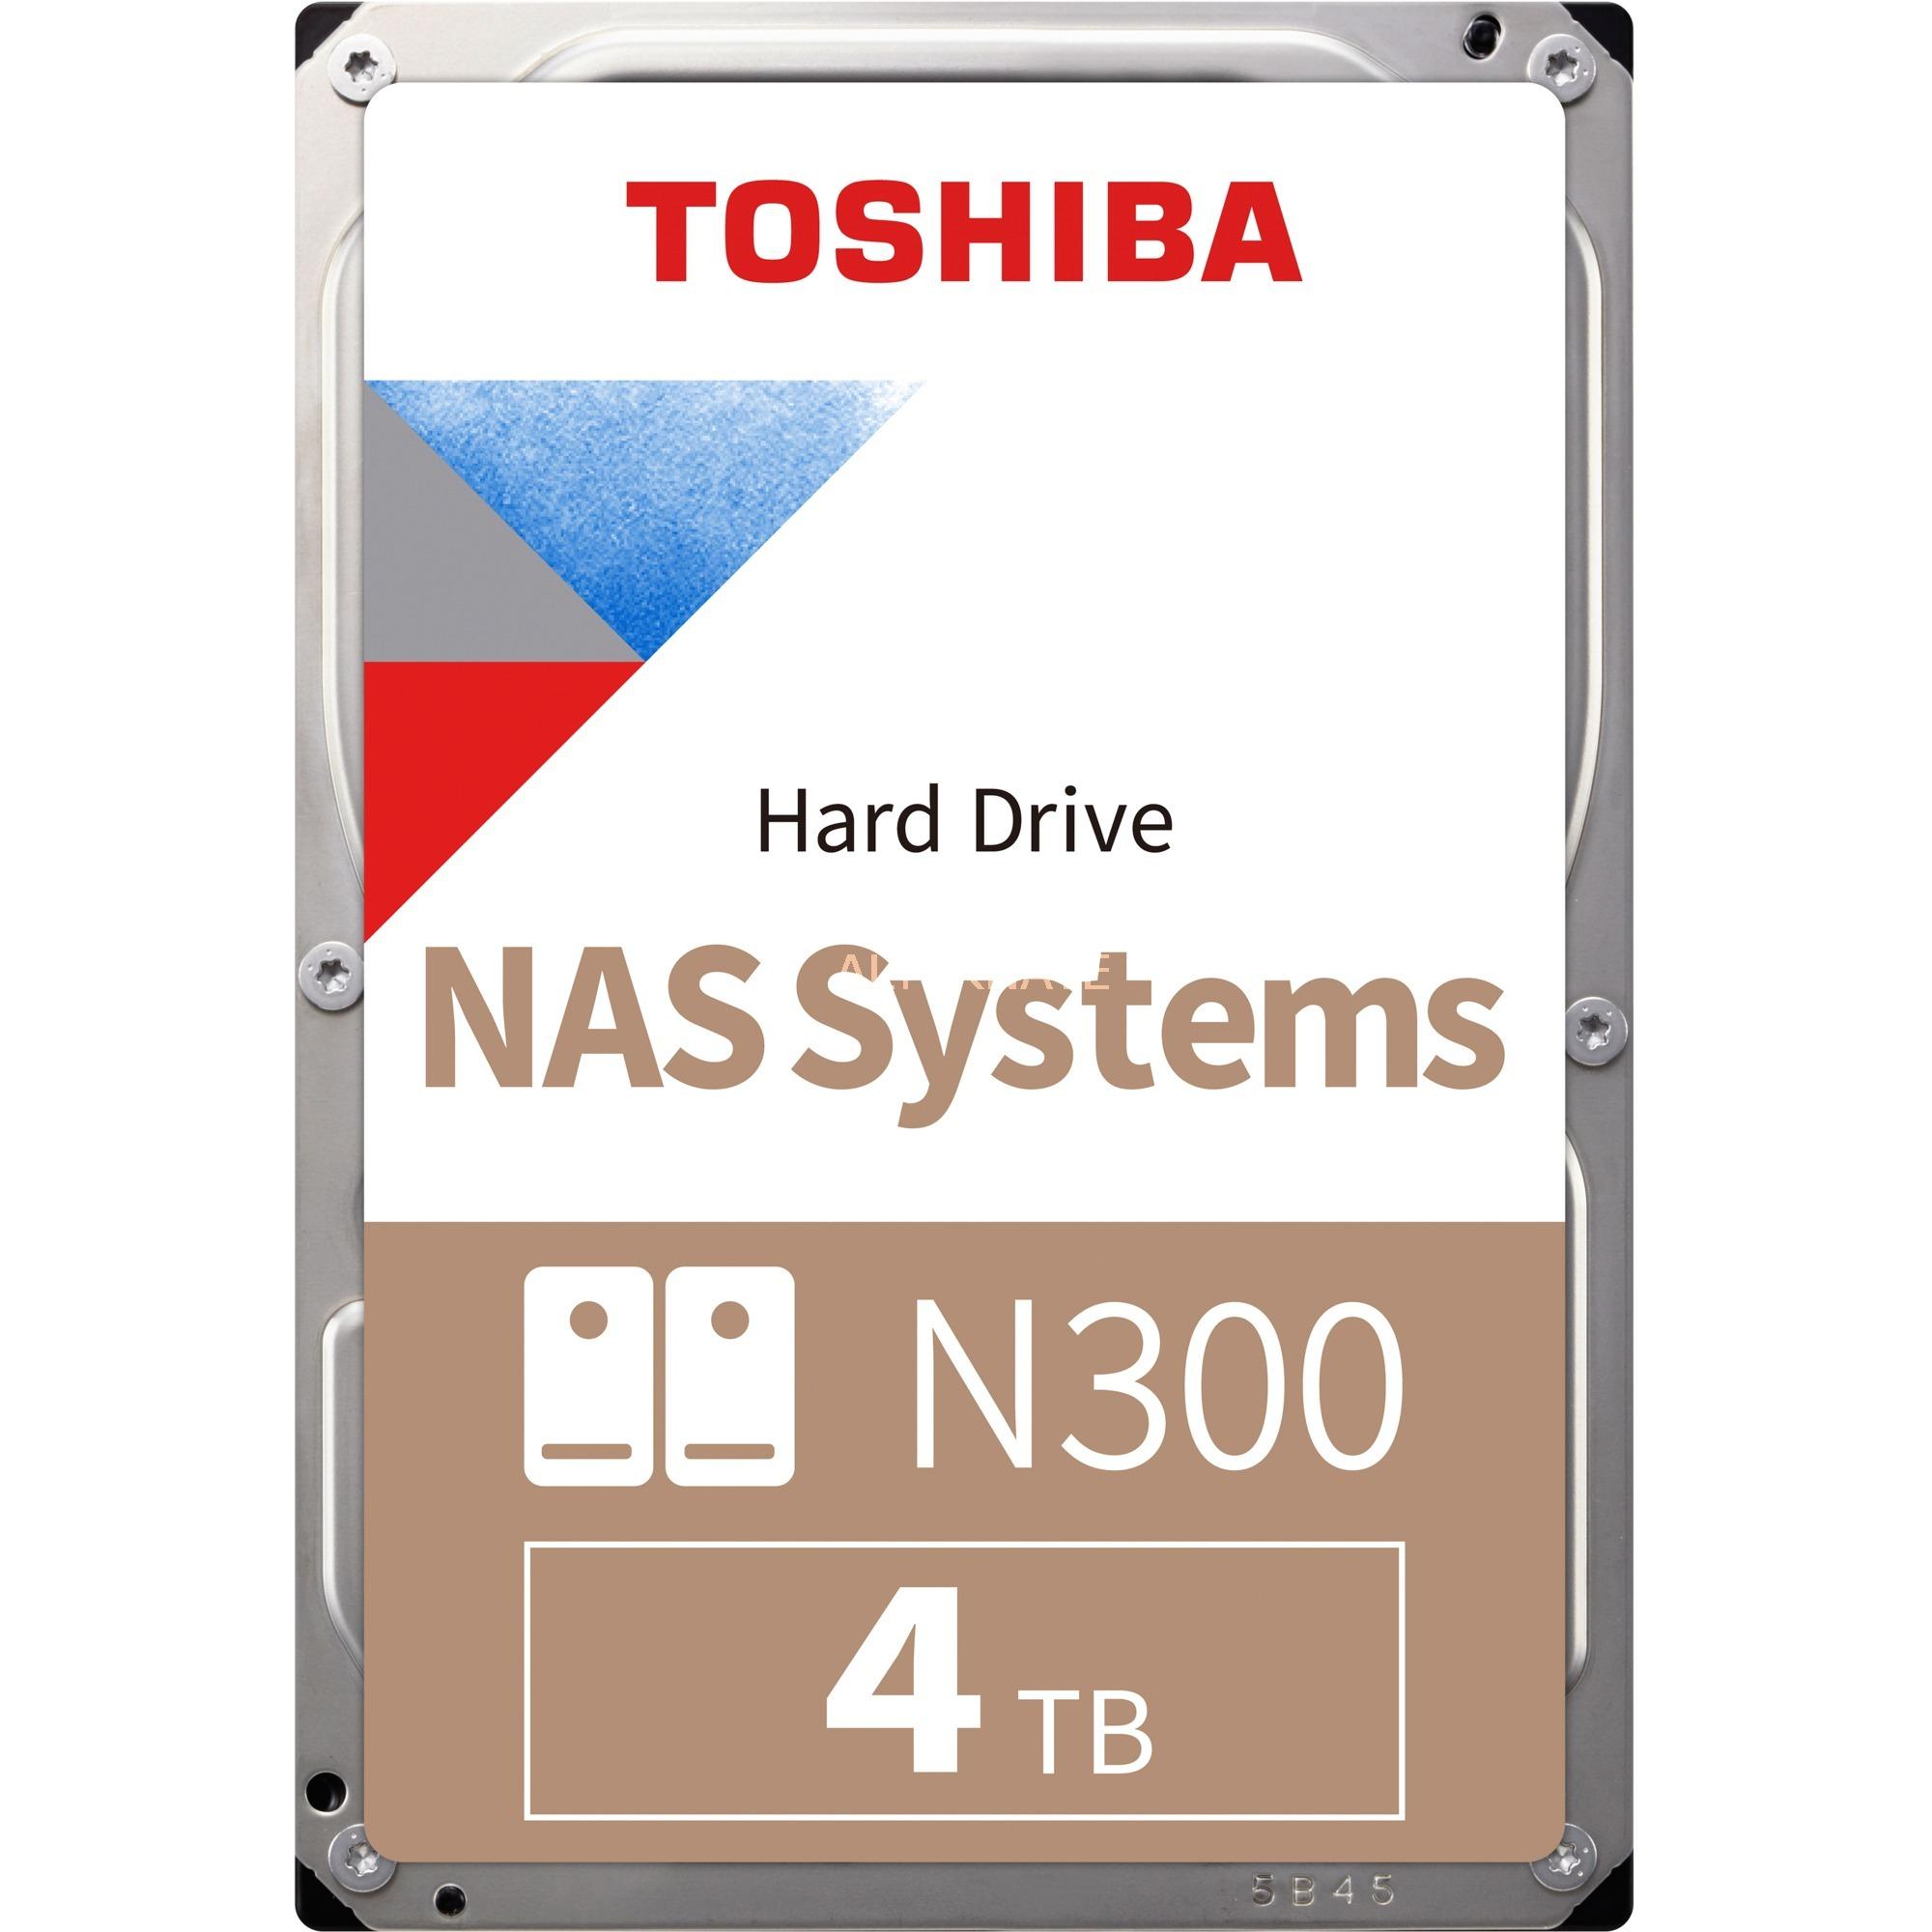 "Toshiba N300 4 TB, Festplatte (SATA 6 Gb/s, 3,5"", Bulk)"